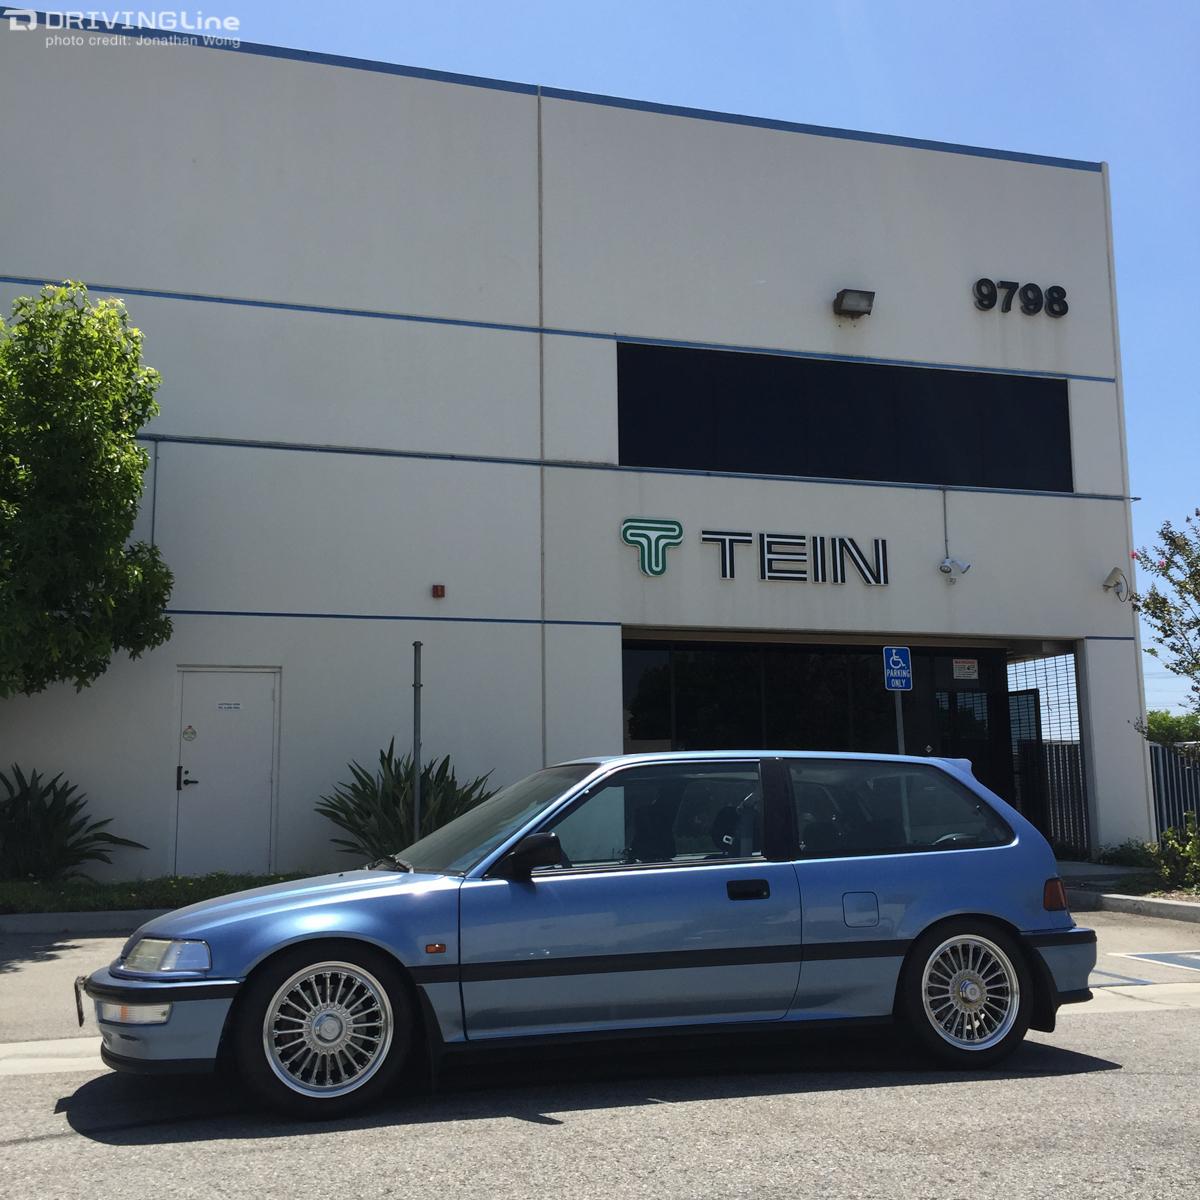 TEIN Coilover Maintenance [Tech] | DrivingLine